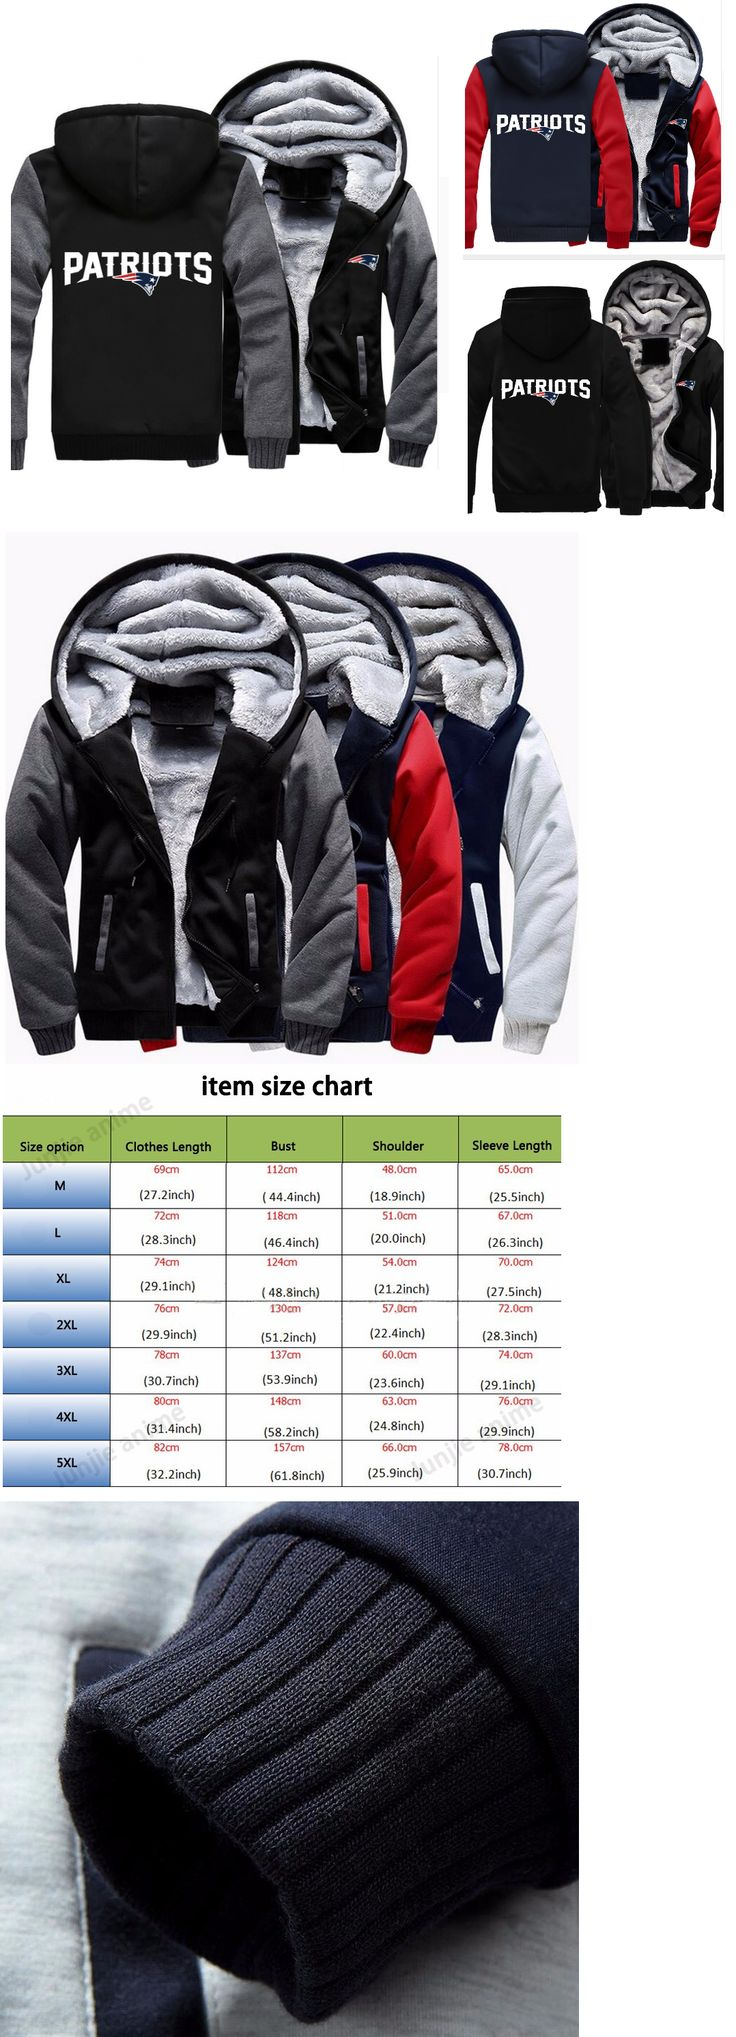 Men 159109: Winter Thicken Hoodie Team New England Patriots Champions Warm Sweatshirt Lacer -> BUY IT NOW ONLY: $54.54 on eBay!